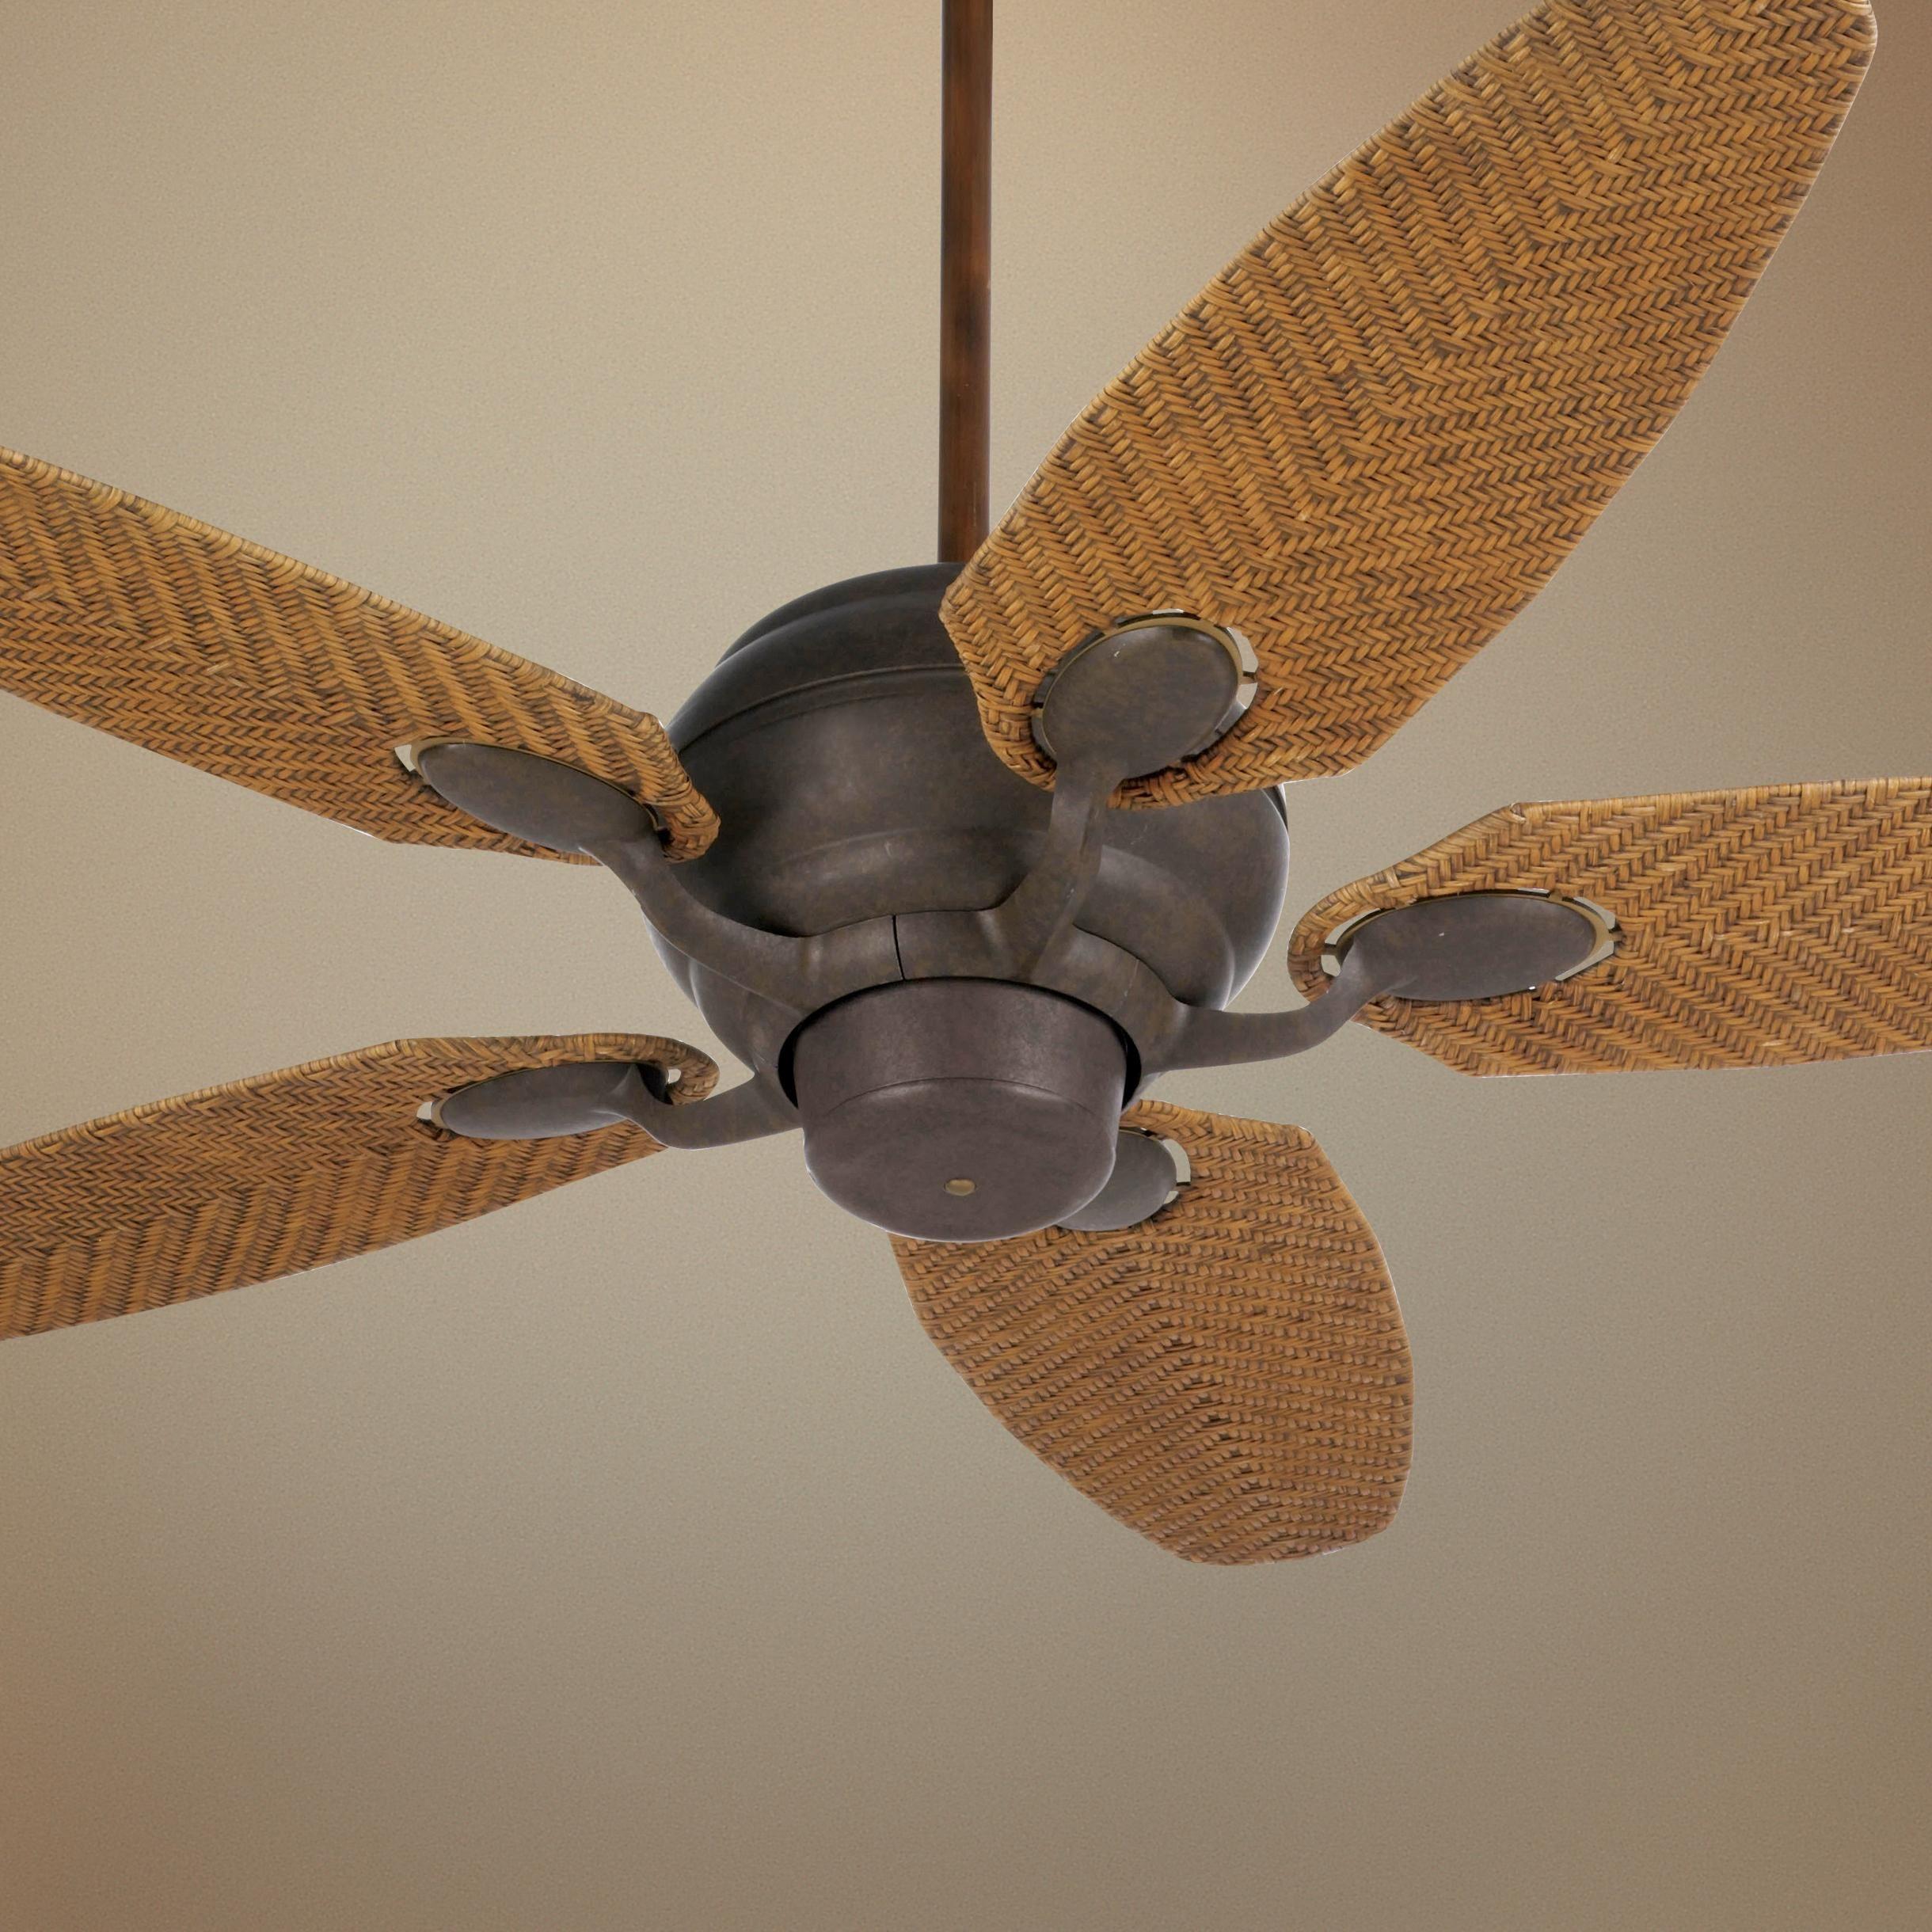 52 Casa Optima Honey Rattan Blades Ceiling Fan Ceiling Fan Coastal Ceiling Fan Tropical Ceiling Fans